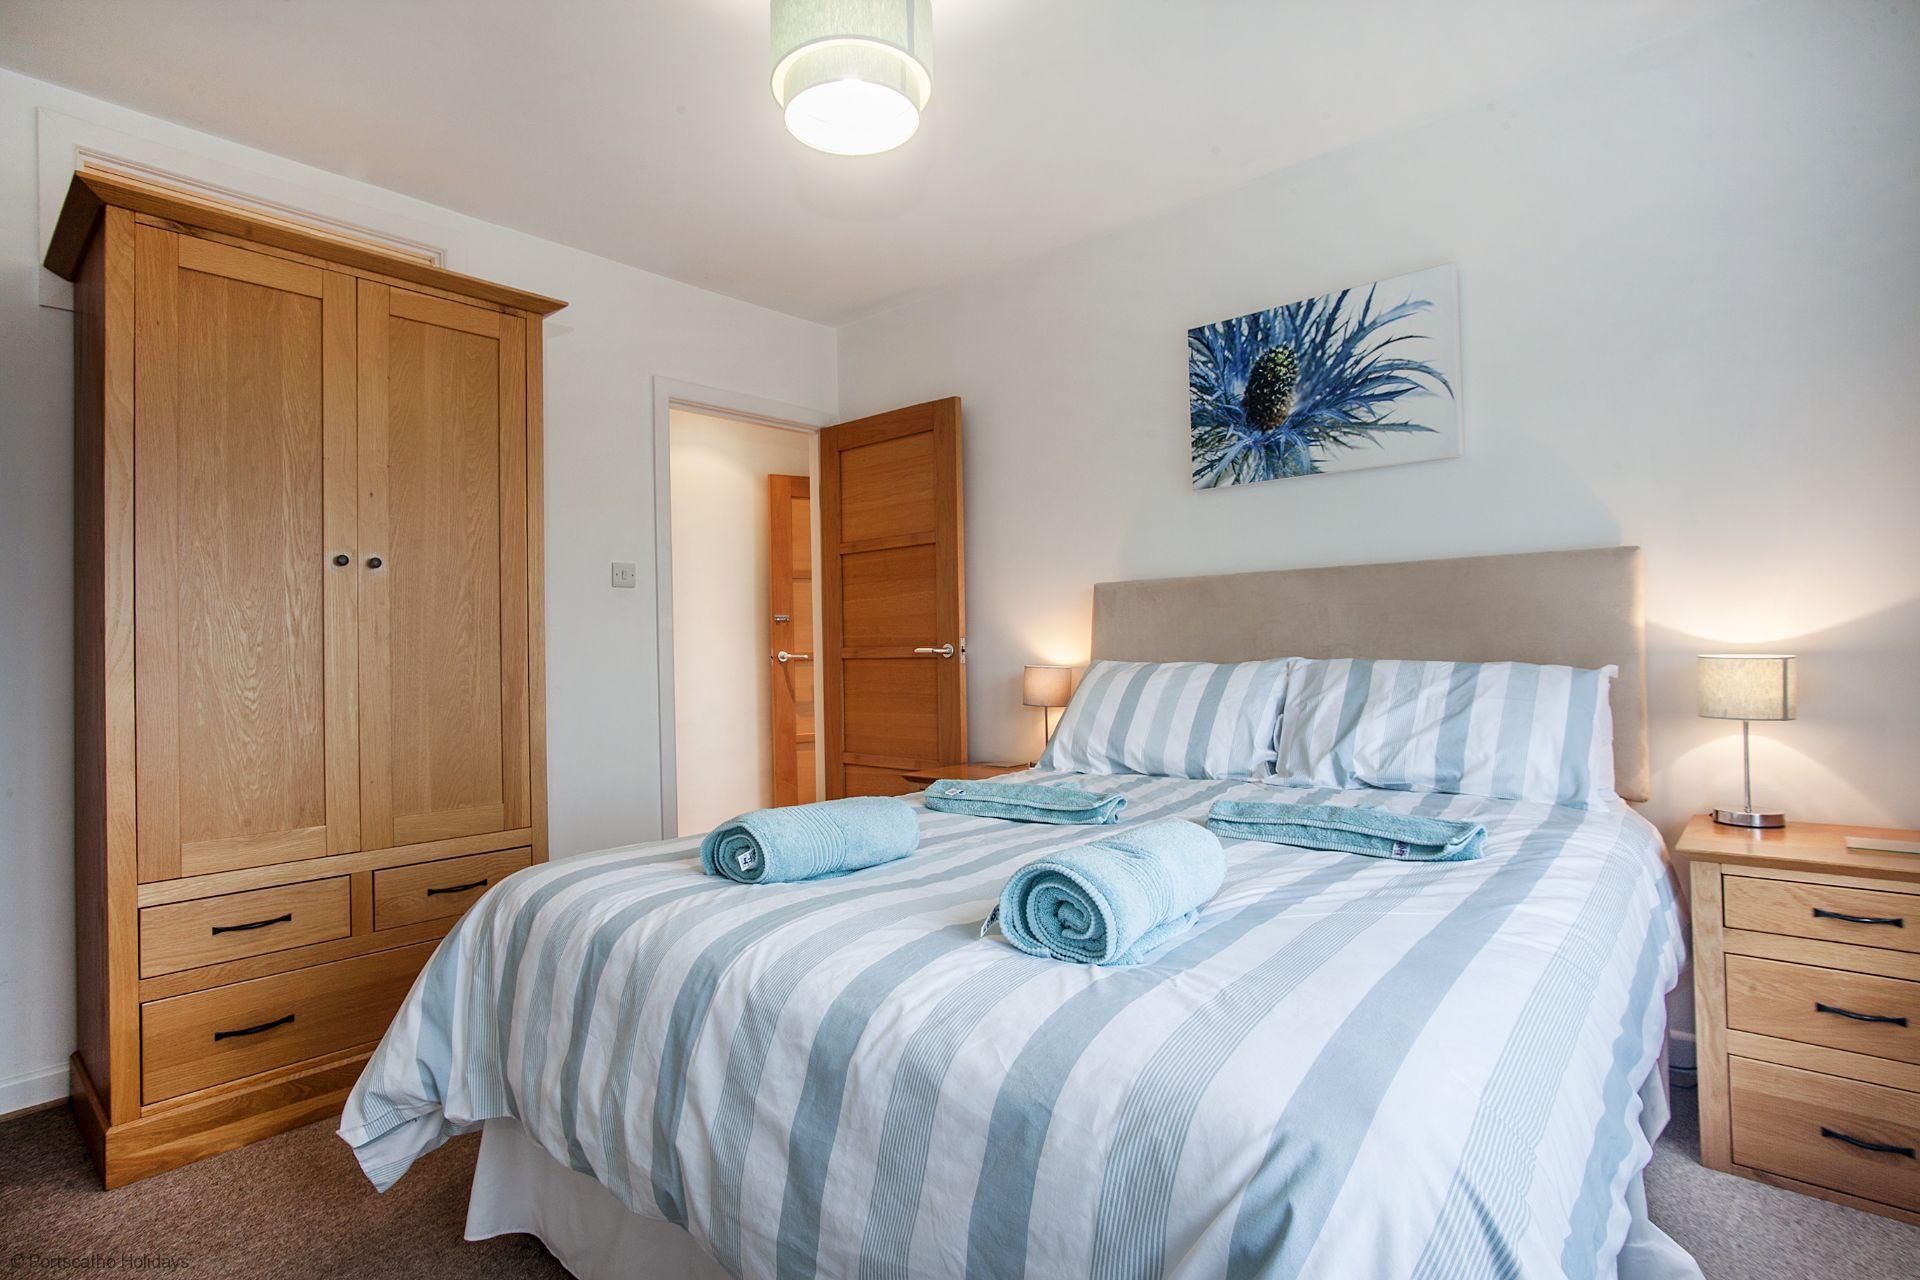 A Loft; St Mawes; Master Bedroom II